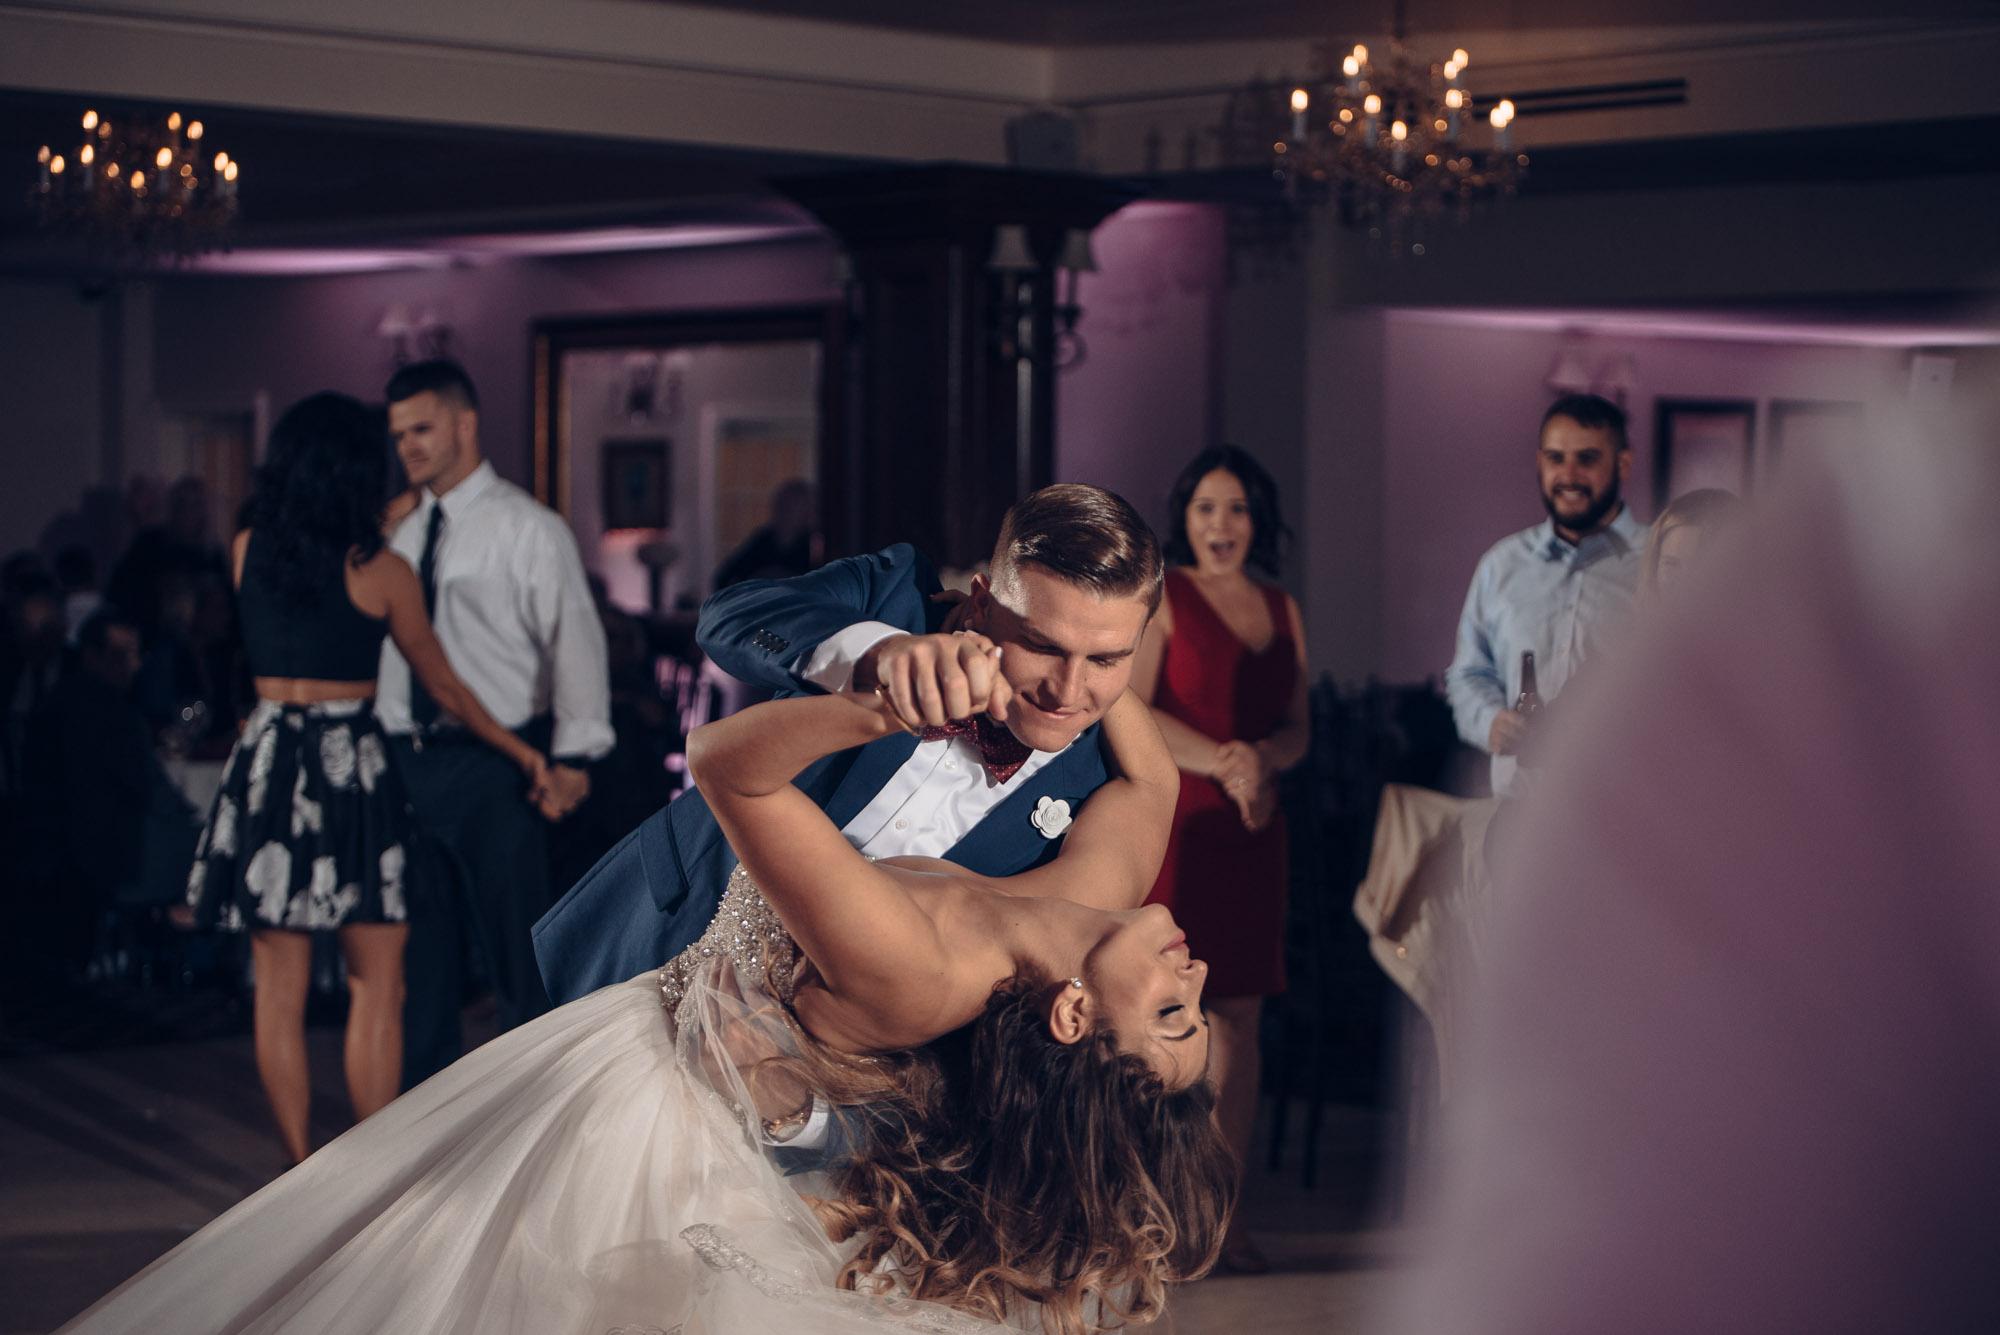 woodwinds_wedding_171020_web-64.jpg